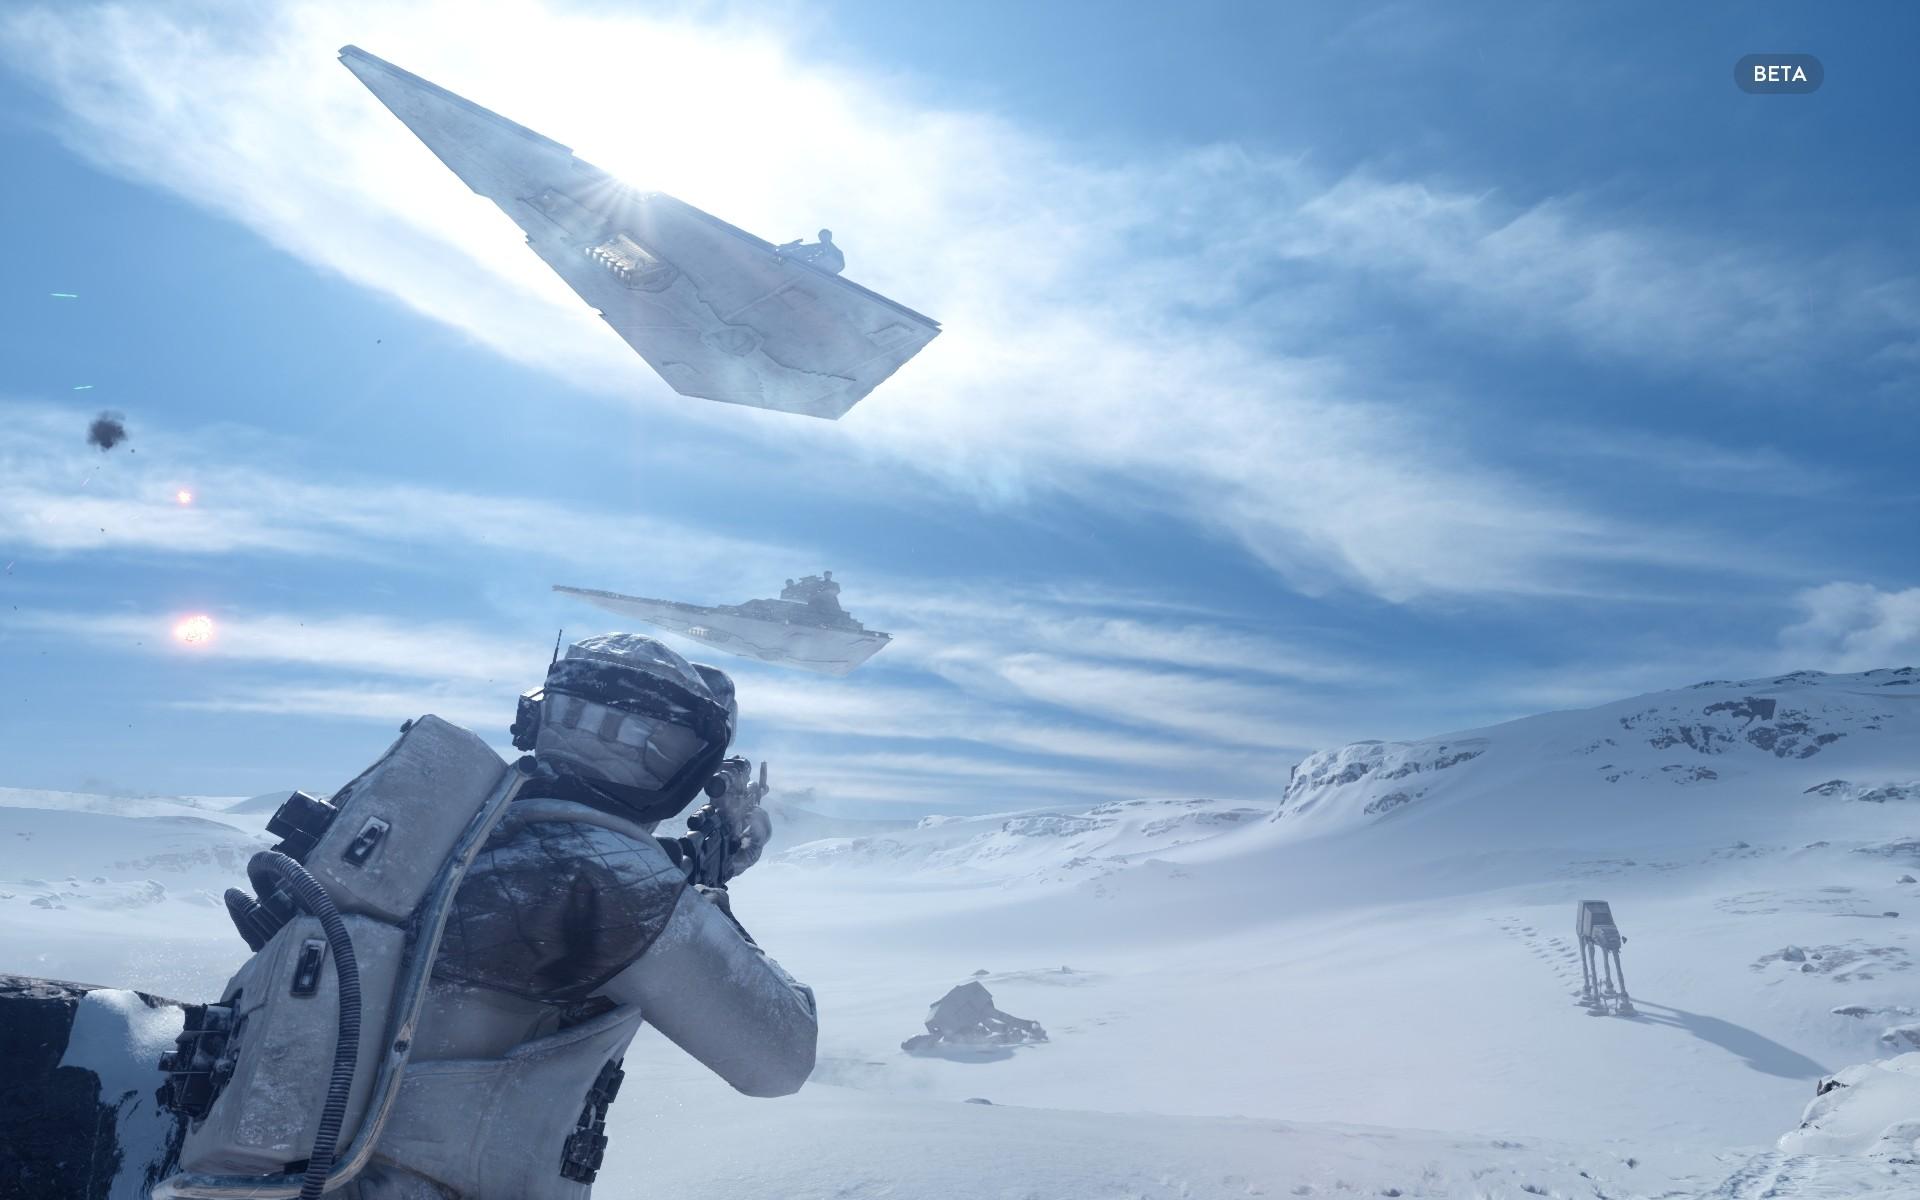 Star Wars: Battlefront Screenshot 9